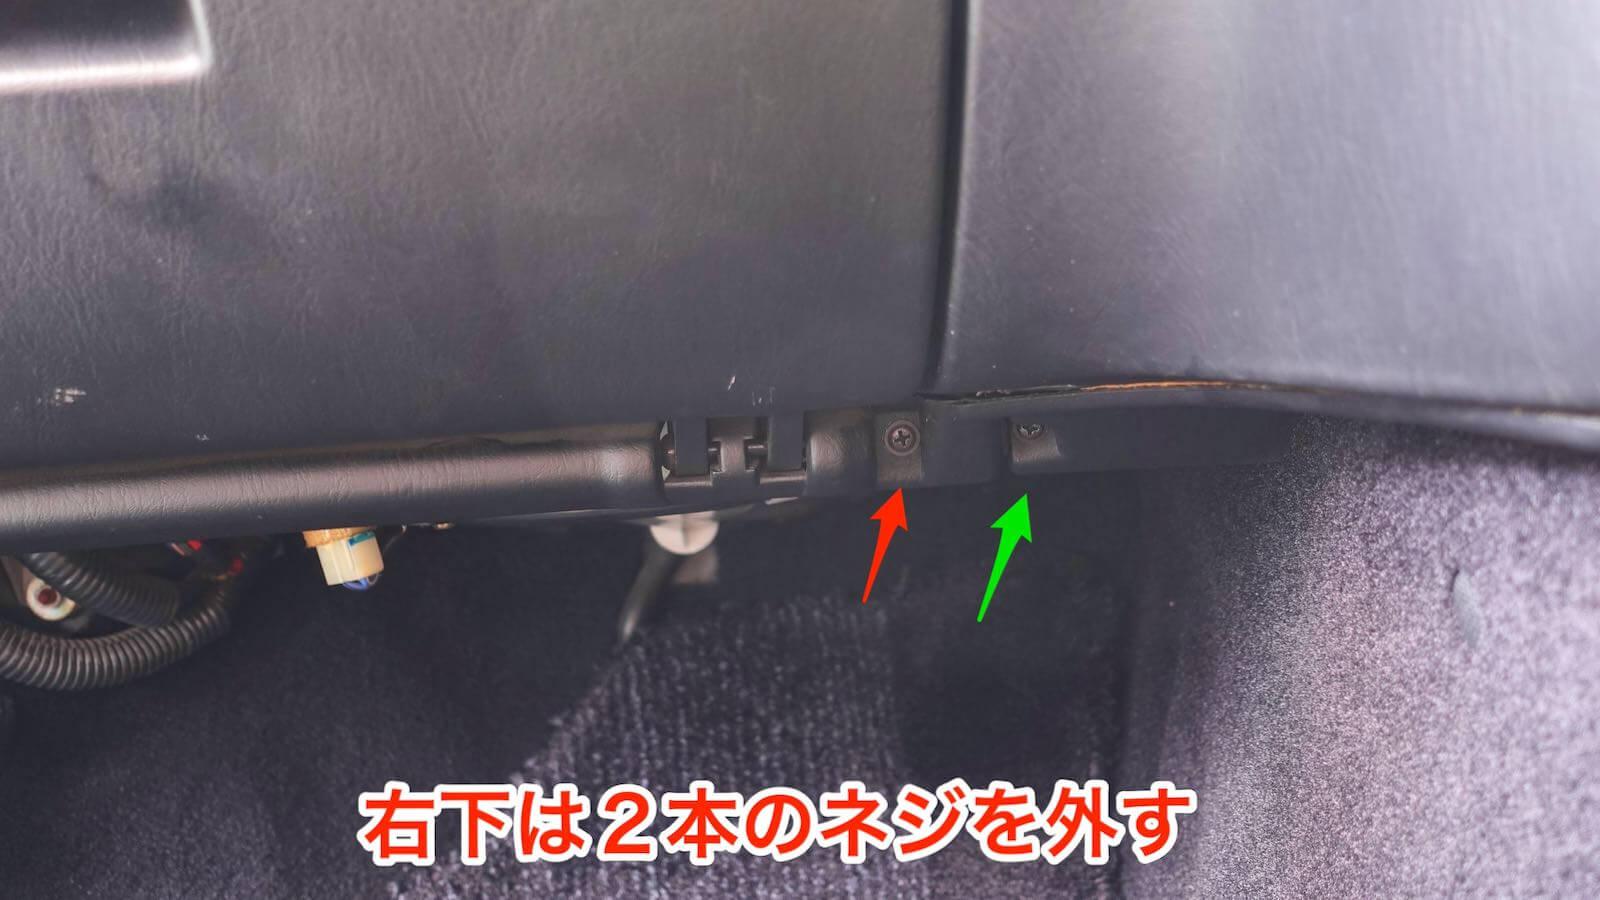 MR2 glove box screw position